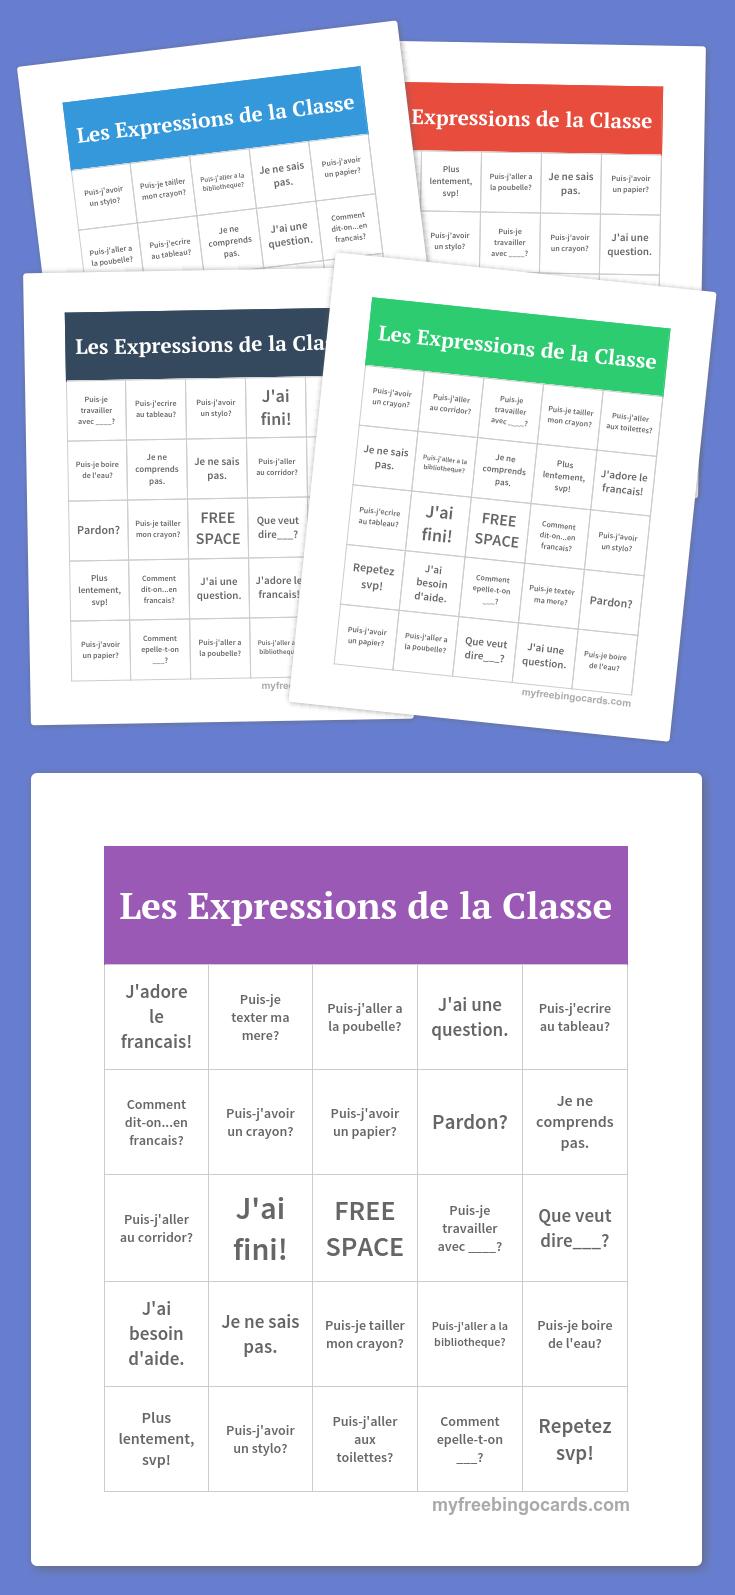 Free Printable Bingo Cards | File | Pinterest | Bingo, Bingo Cards - Free Printable Bingo Cards For Teachers